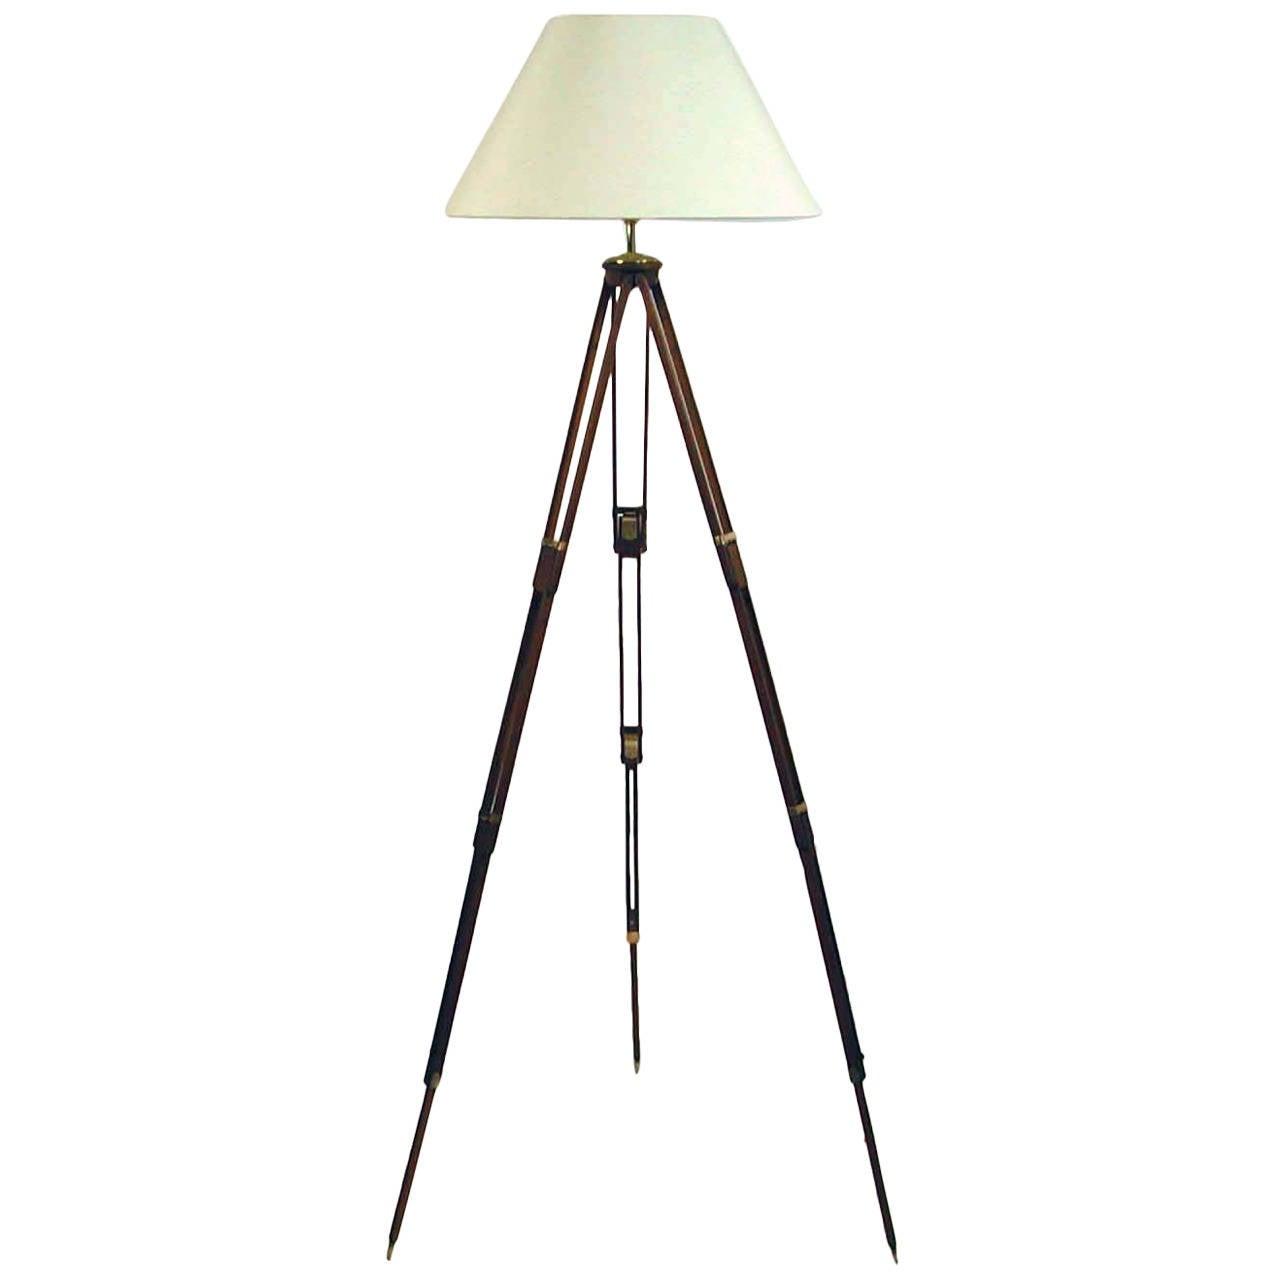 Vintage Wooden Tripod Floor Lamp For Sale At 1stdibs